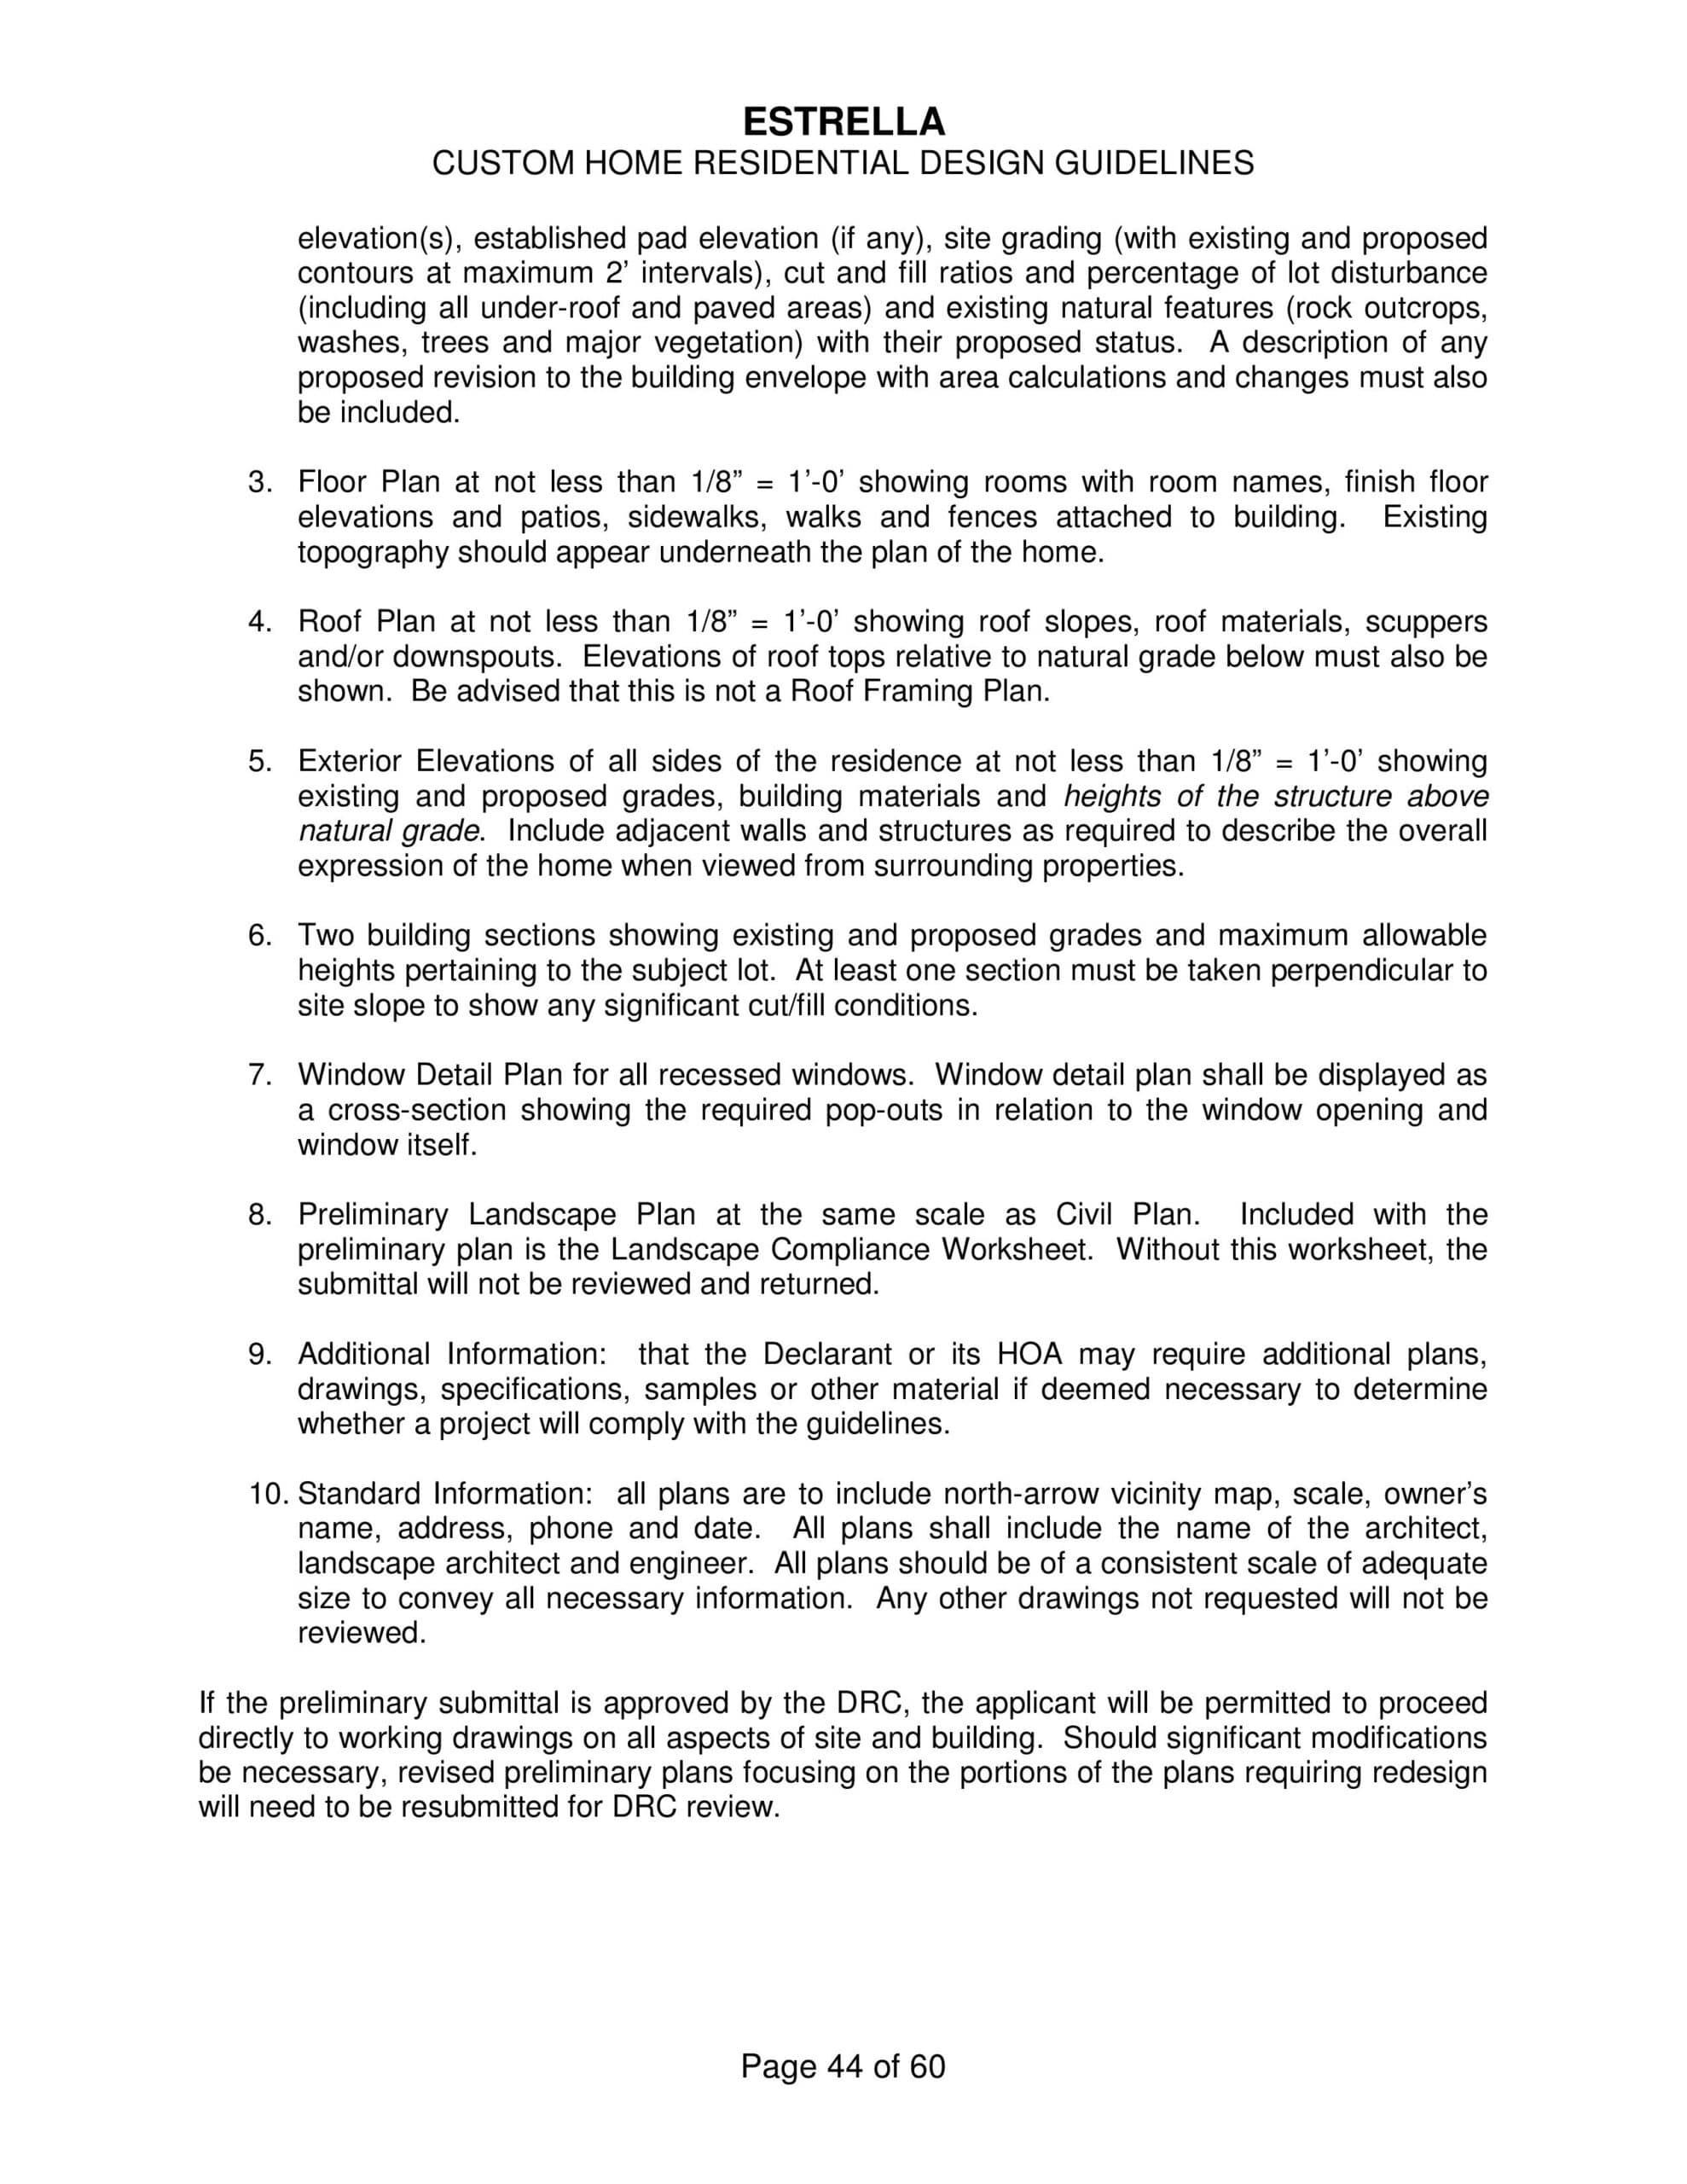 ESTRELLA MOUNTAIN CUSTOM HOME GUIDELINES-page-048